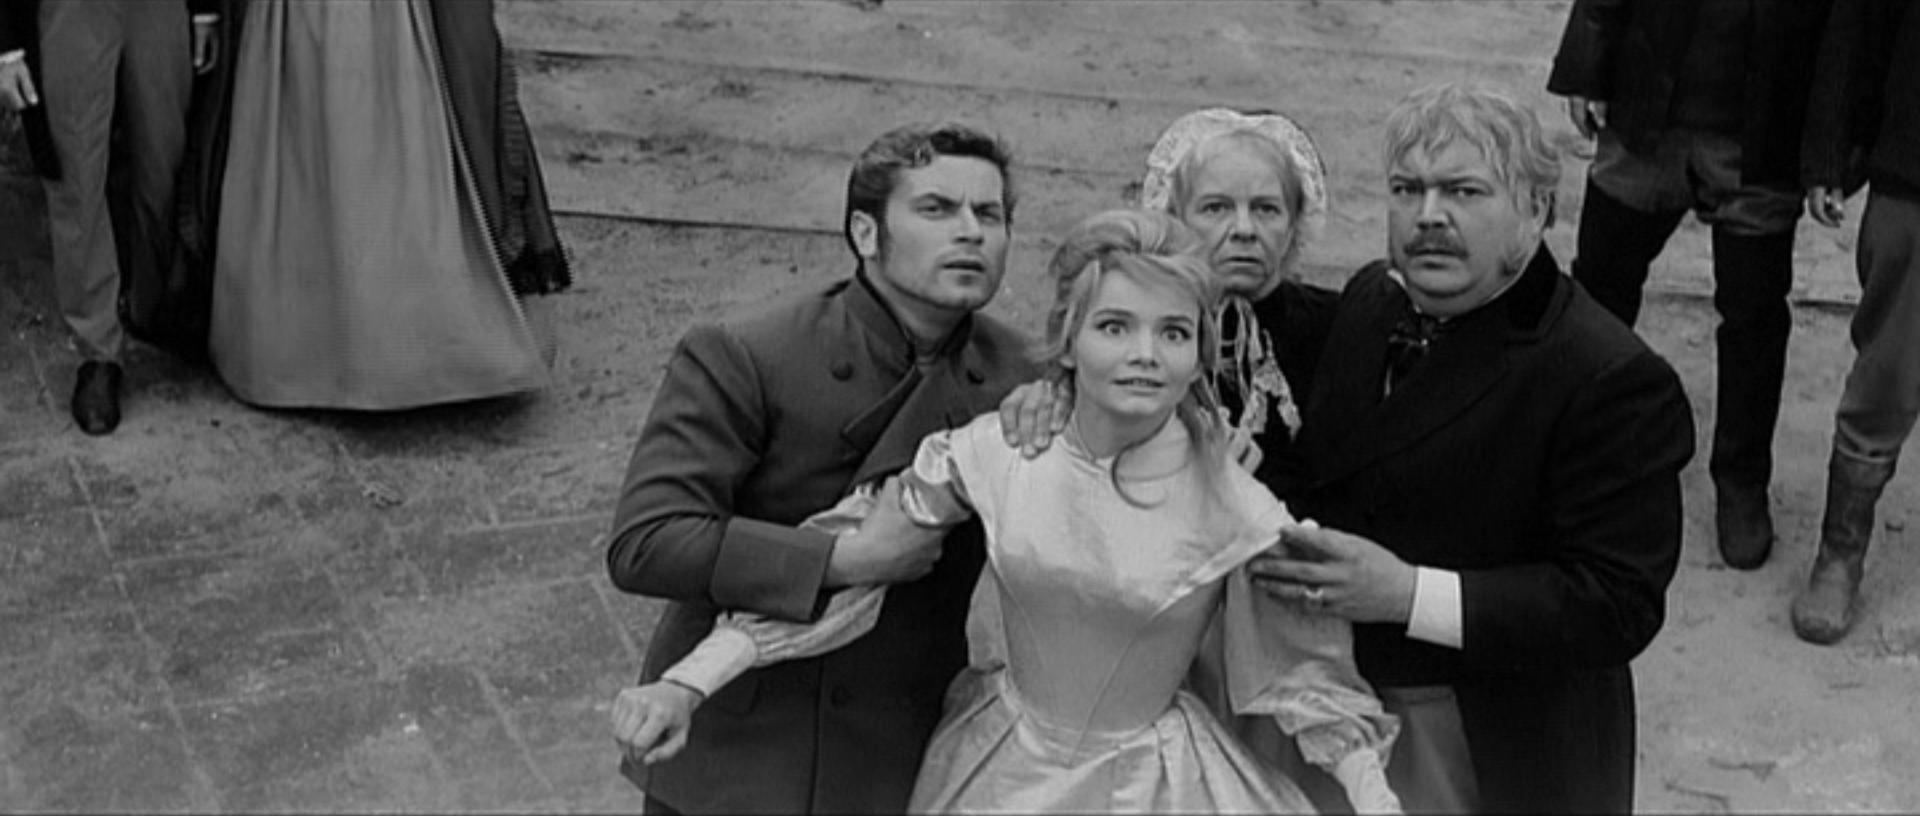 The Flying Dutchman | East German Cinema Blog